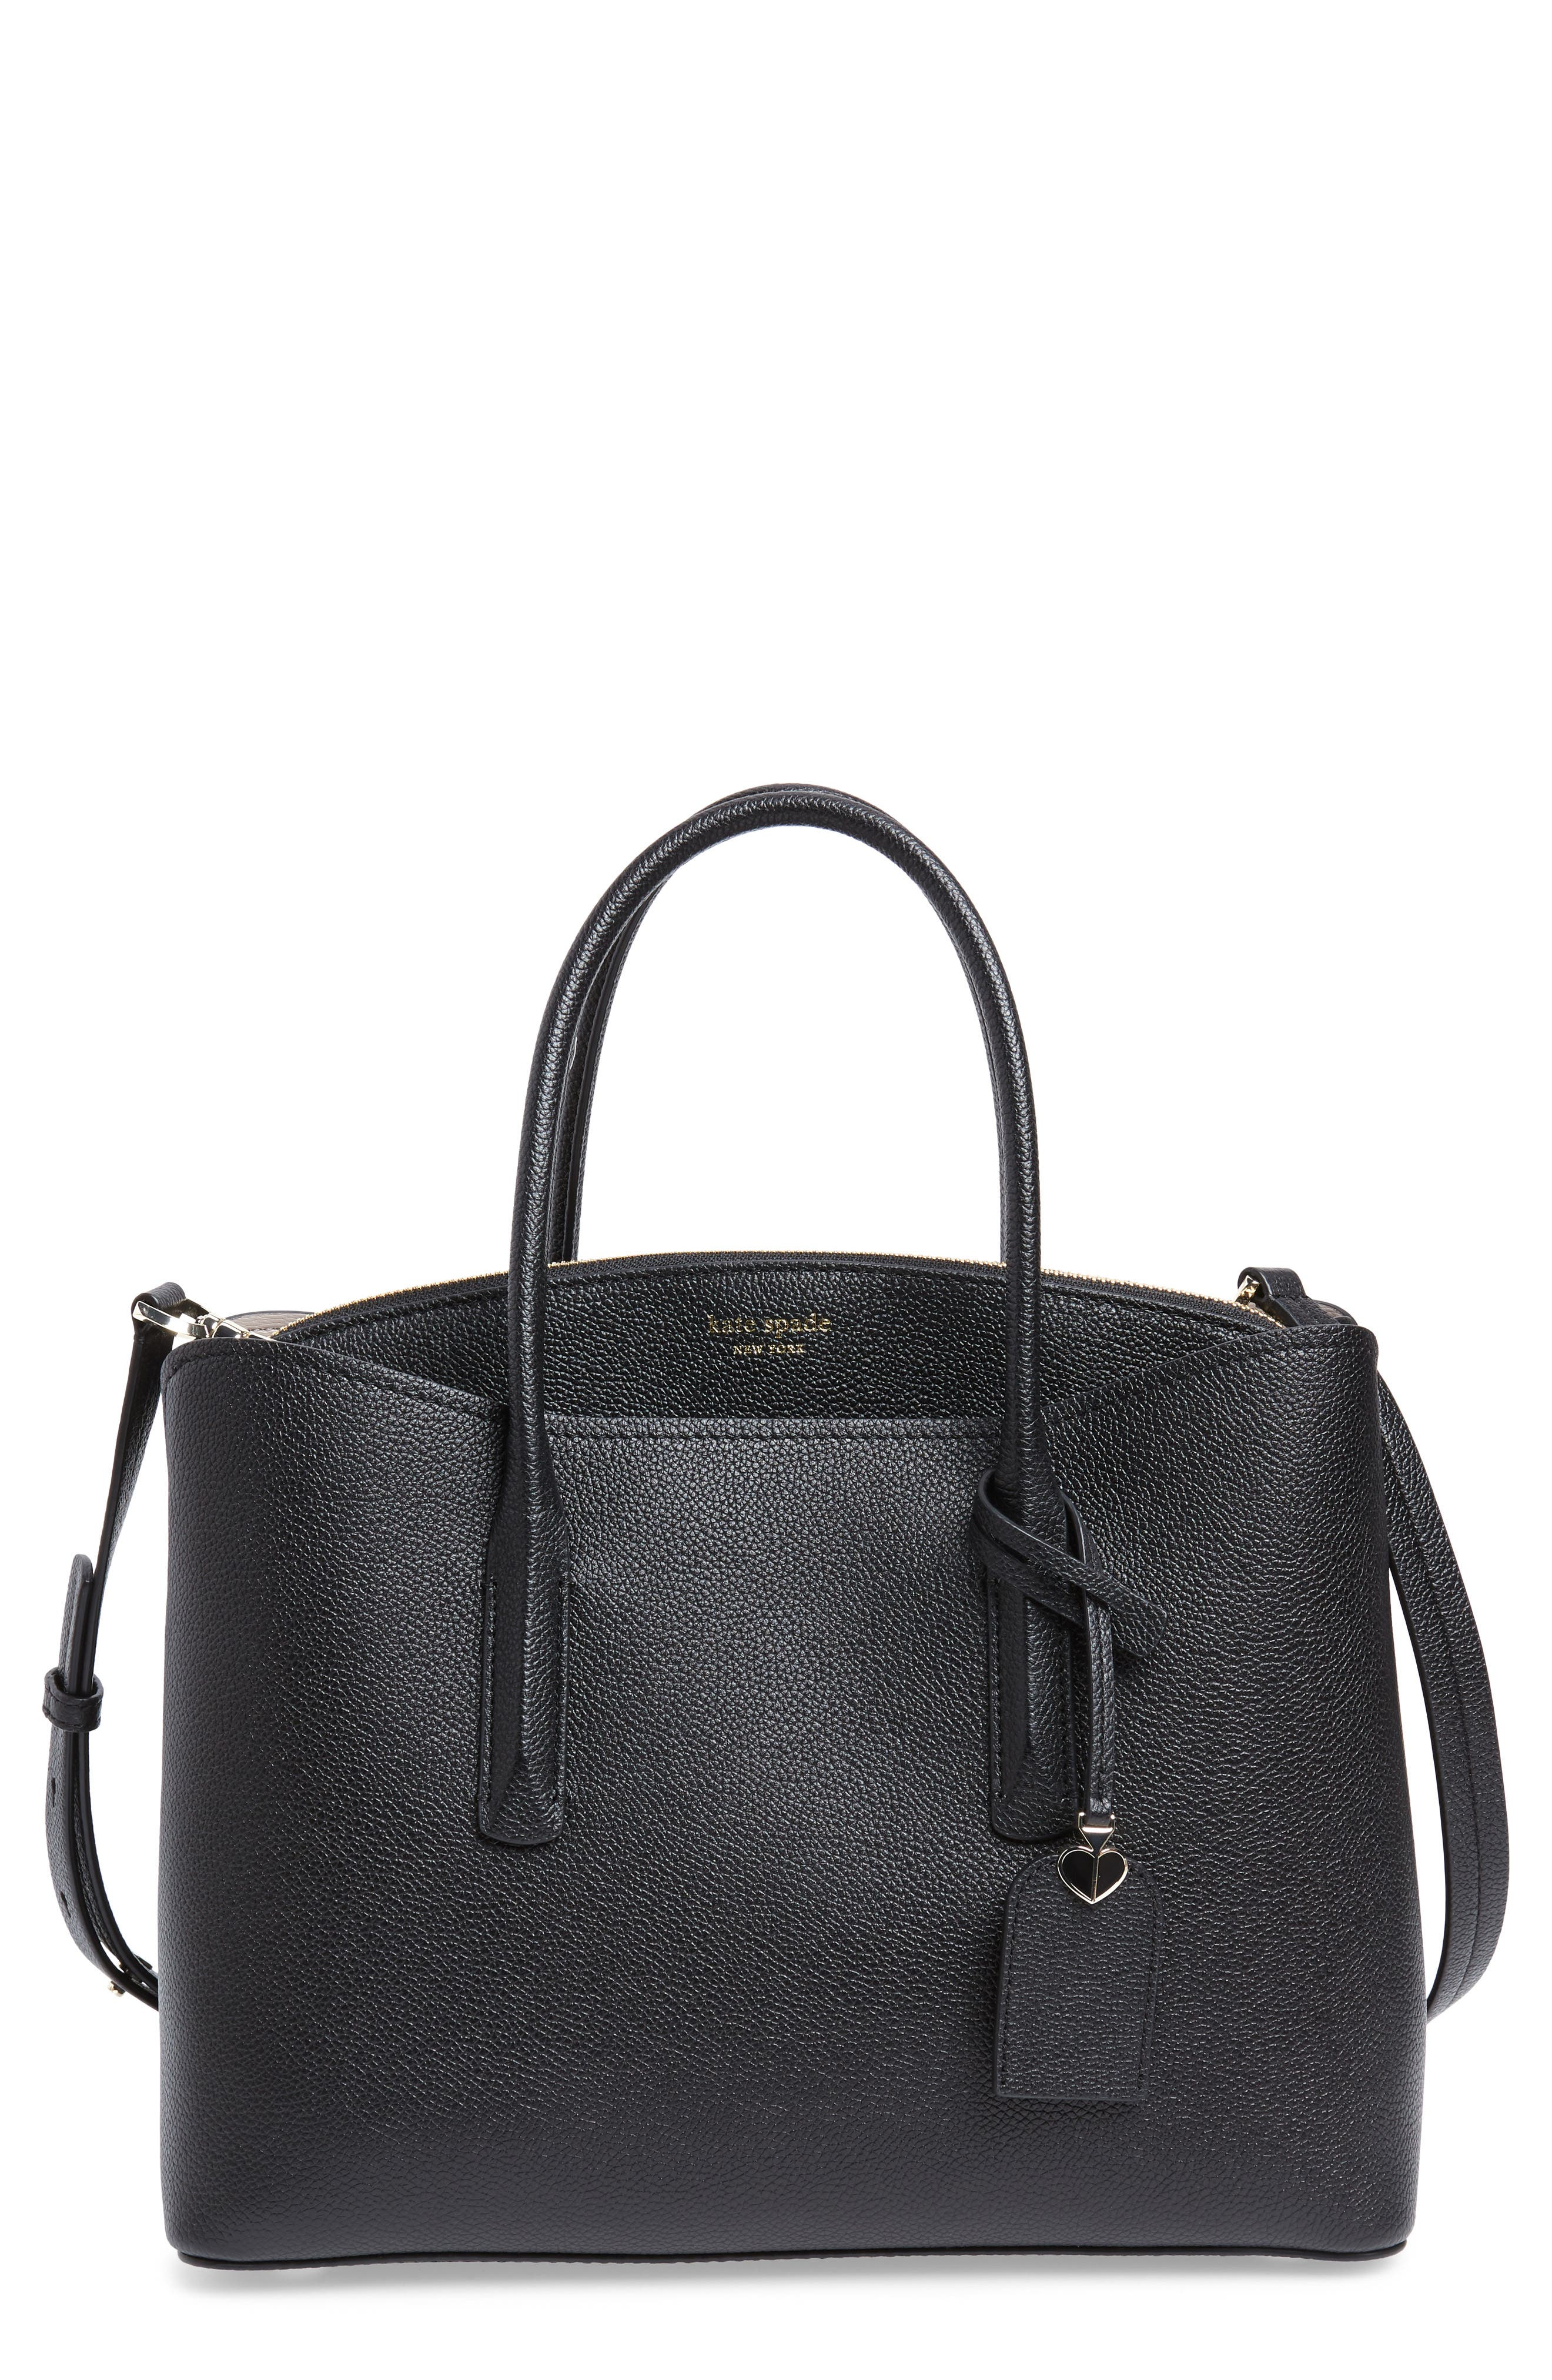 KATE SPADE NEW YORK,                             large margaux leather satchel,                             Main thumbnail 1, color,                             BLACK